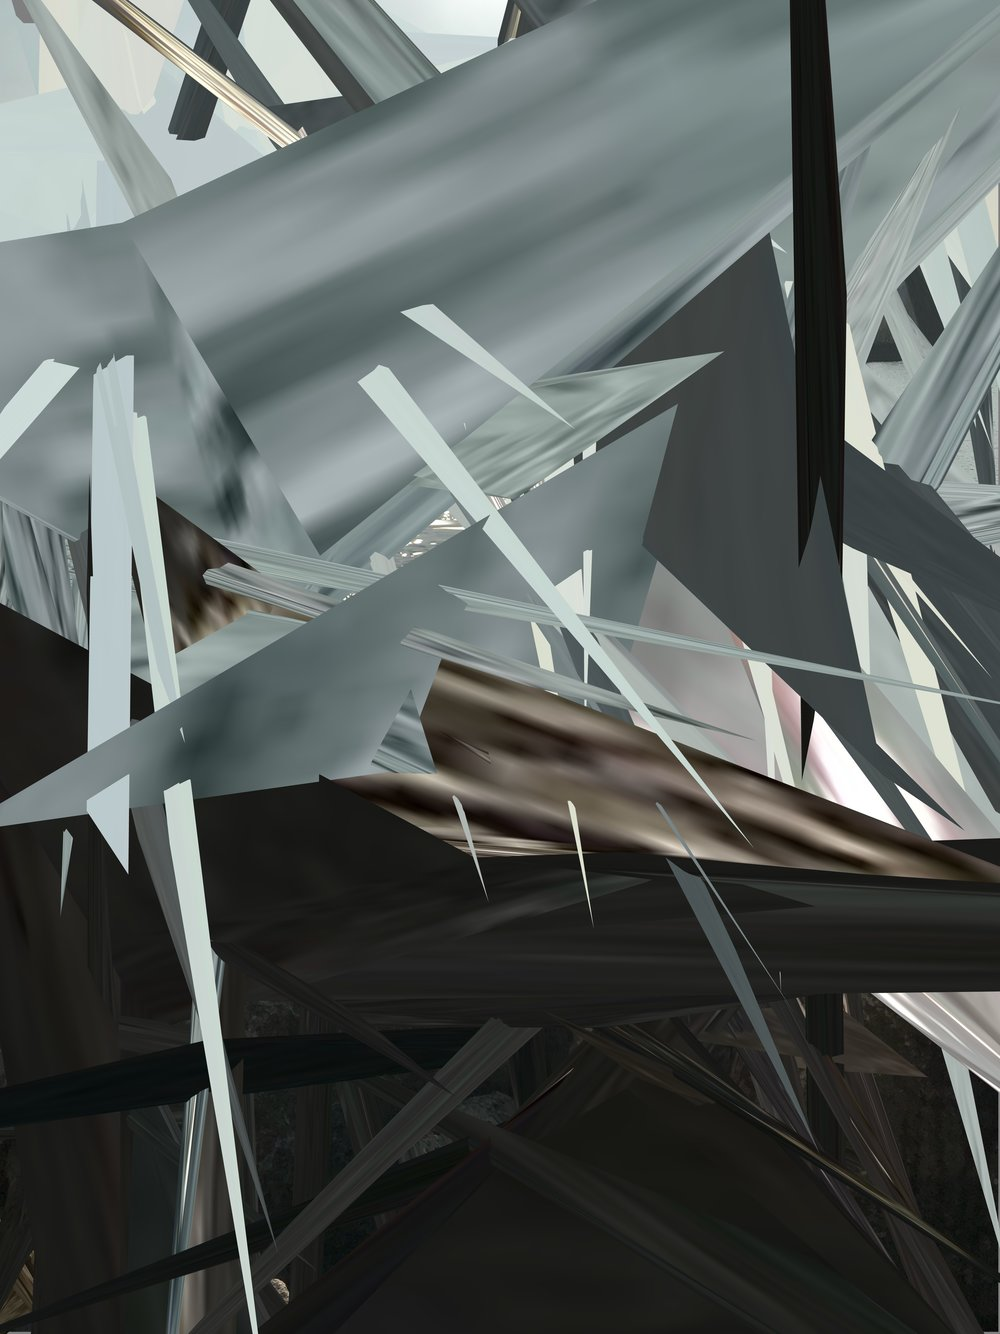 Digital Shrapnel series #9